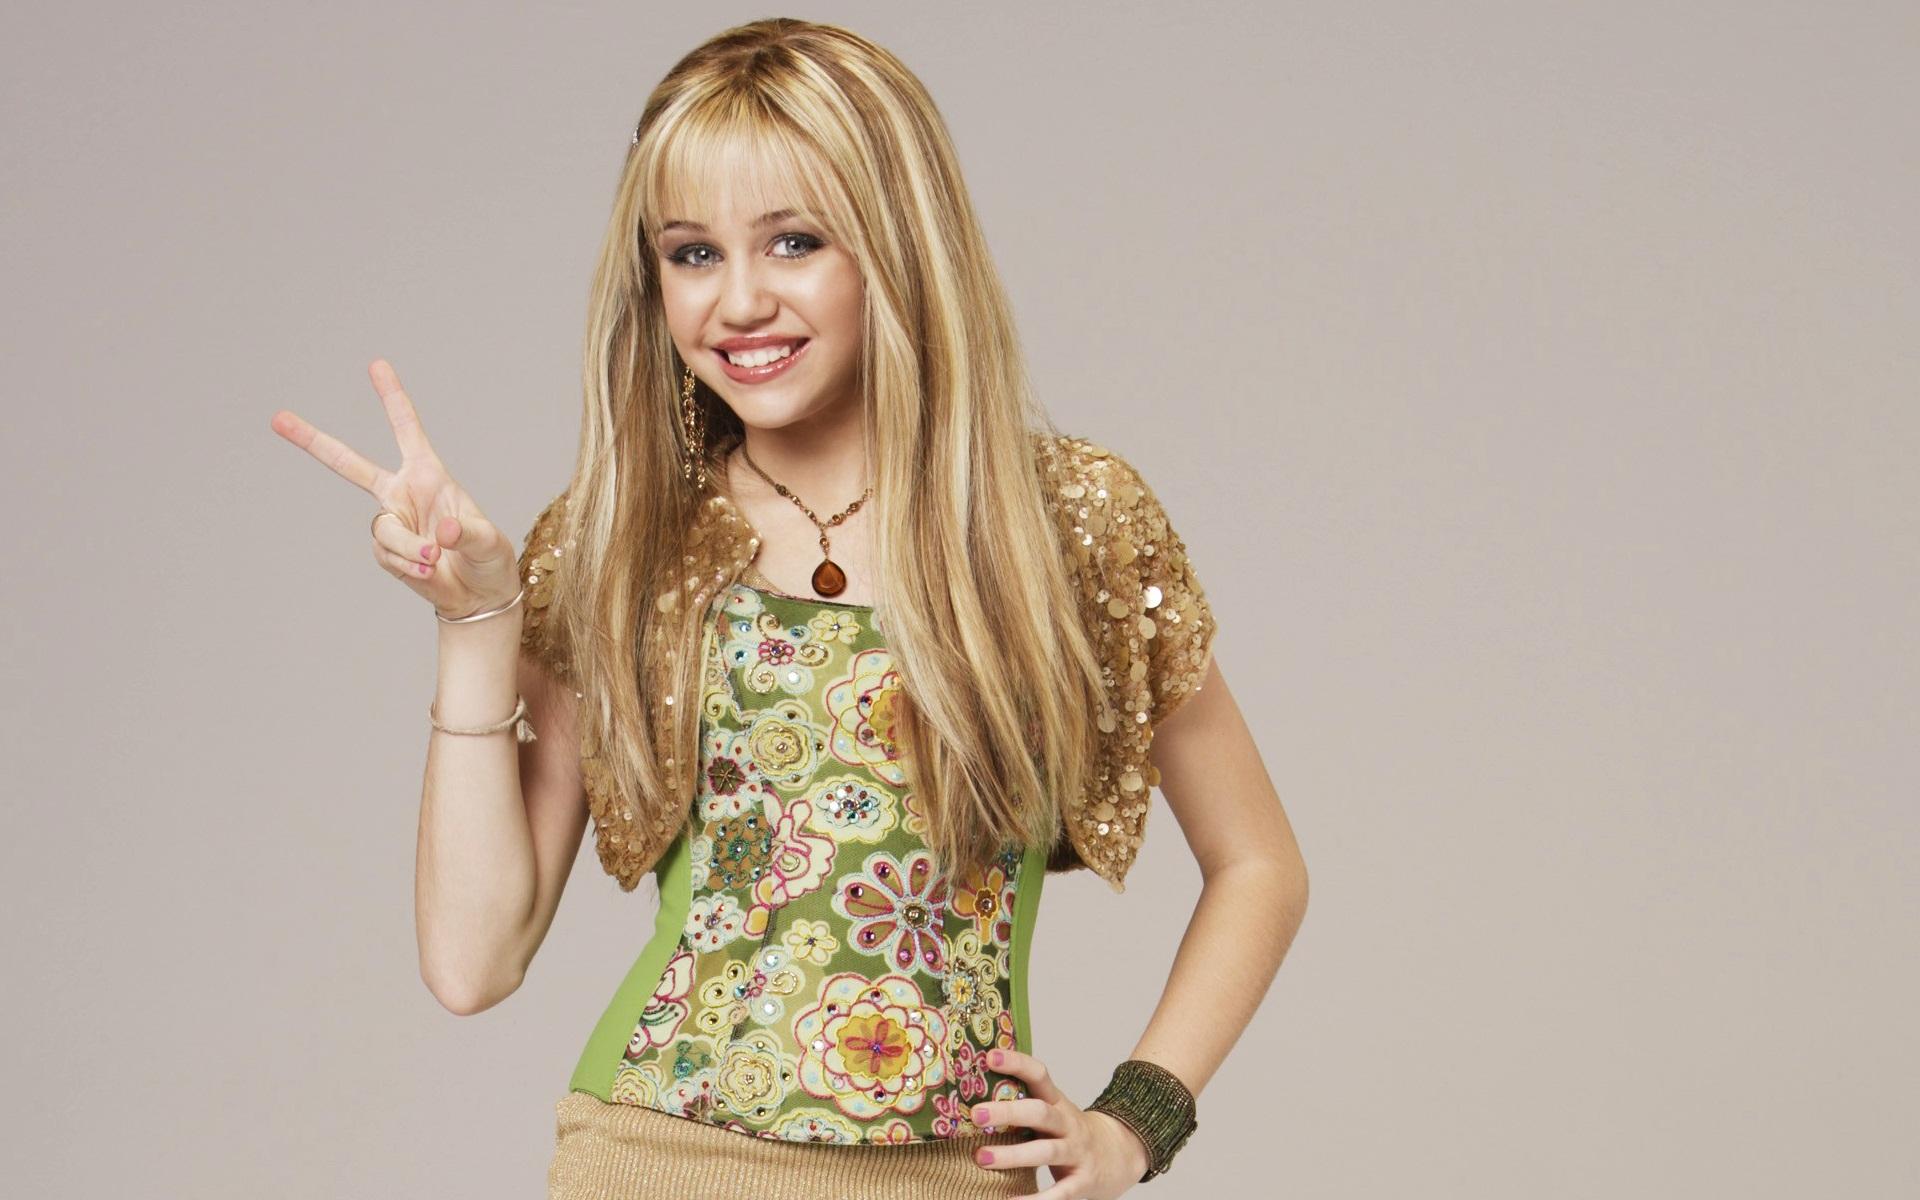 Miley Cyrus 69 wallpaper